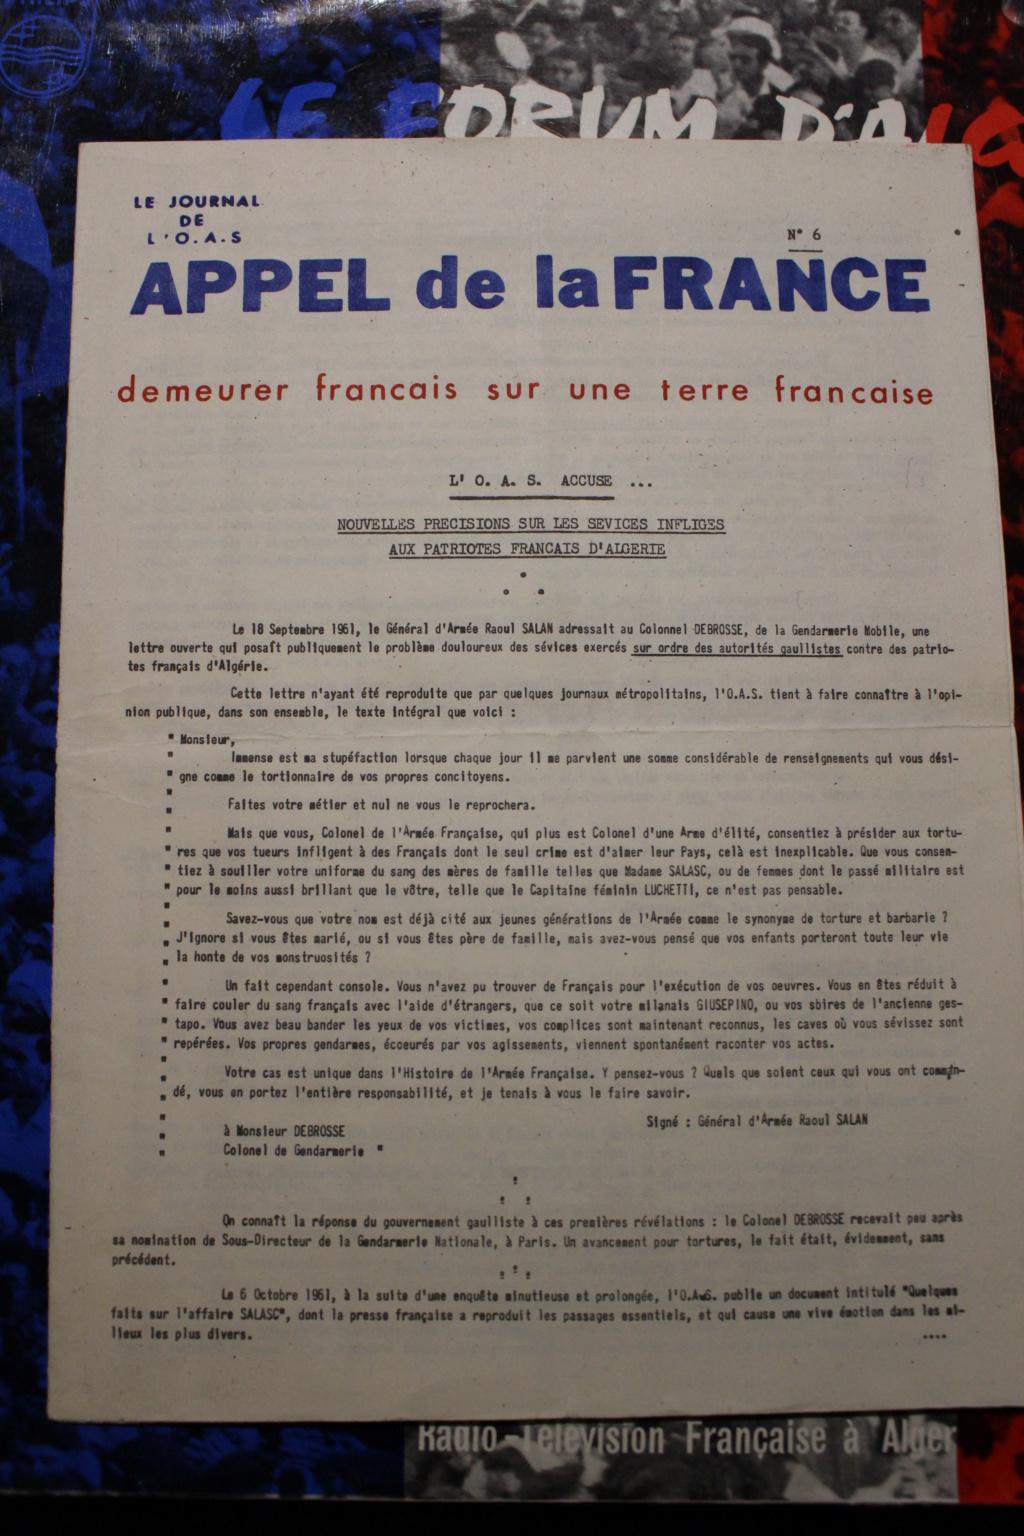 Algérie Française Img_2633